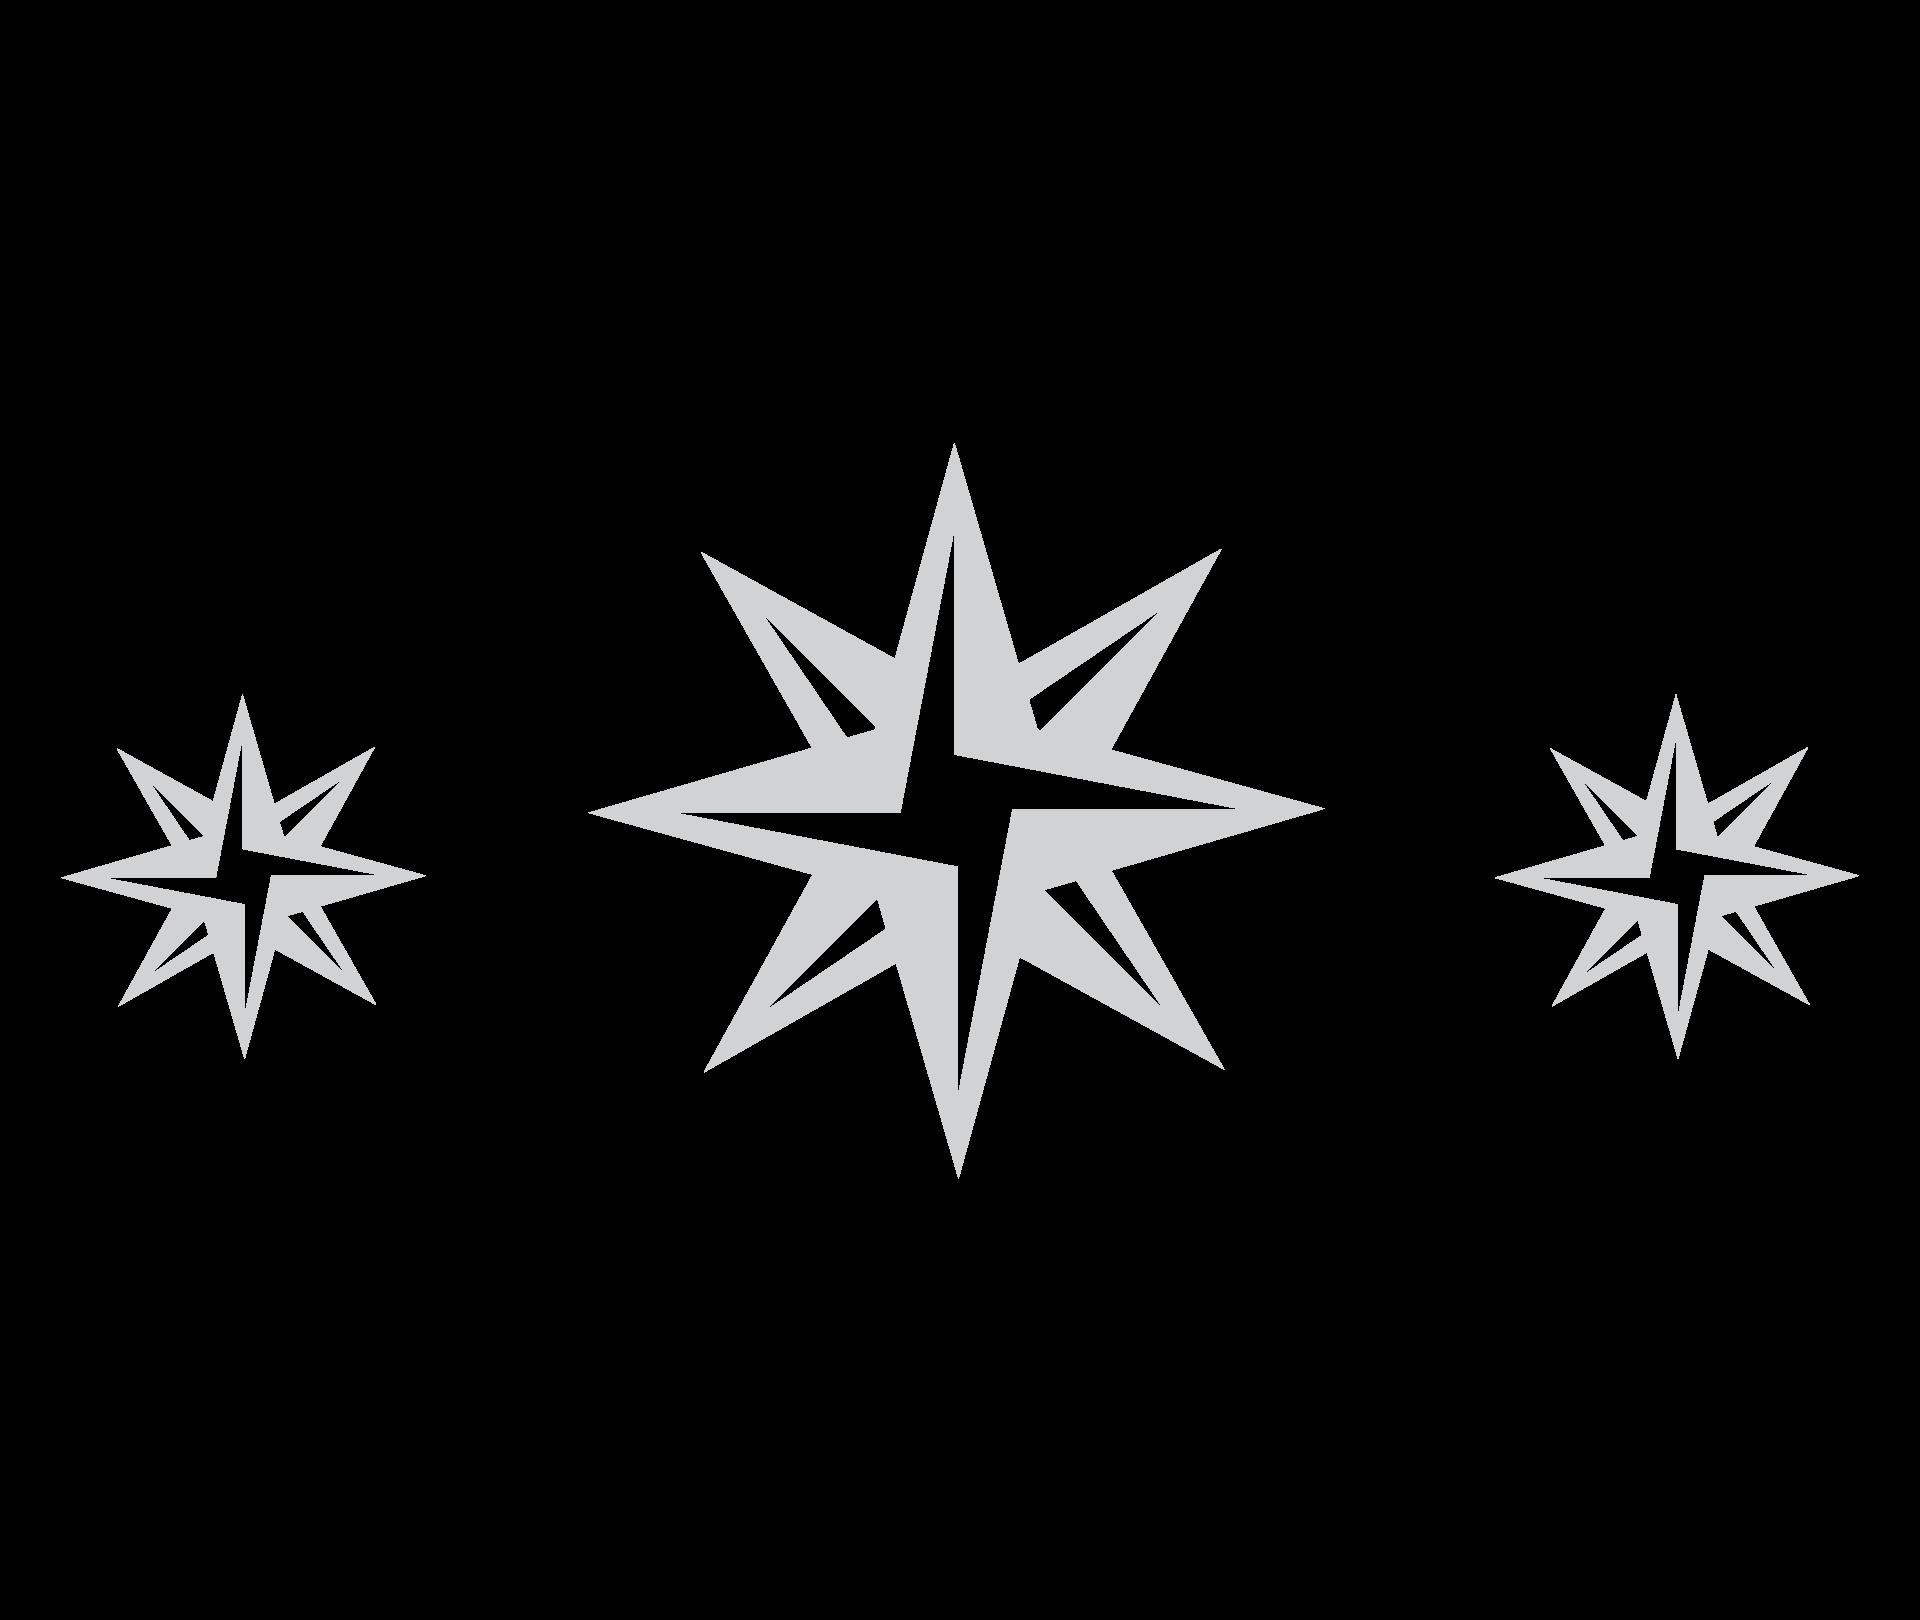 stellar-winery-website-image-stars-watermark-v1-1920x1620